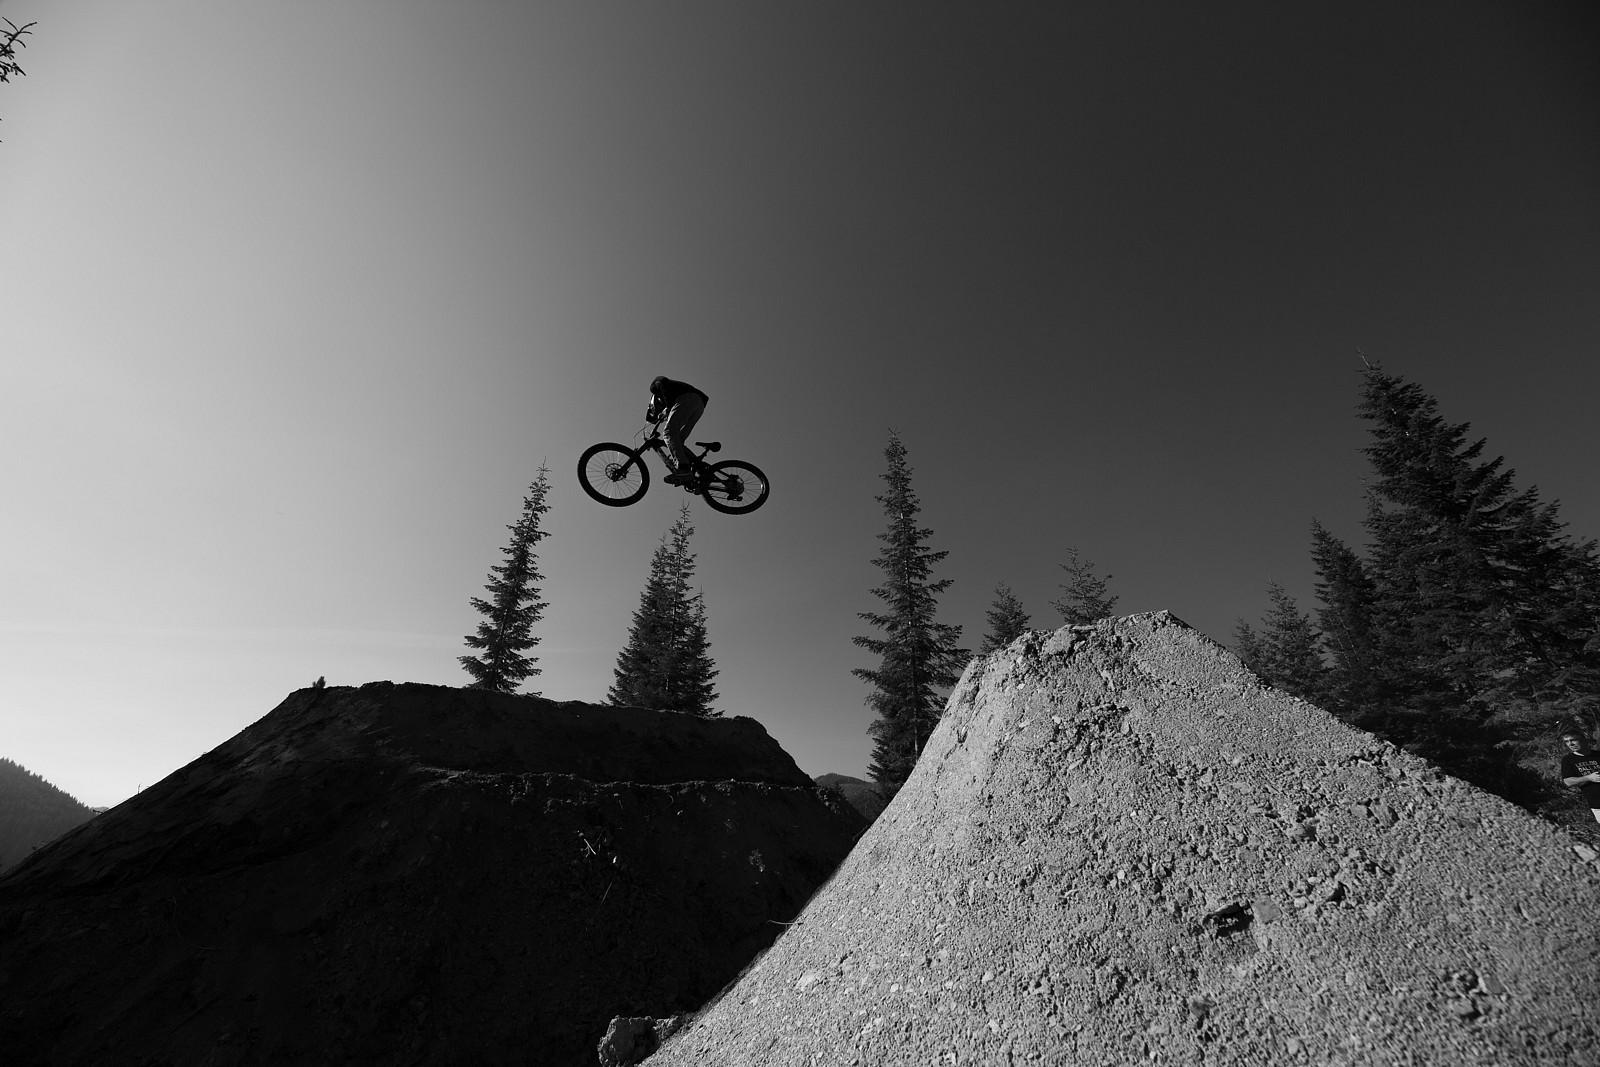 style for days - SVR Bike Park - Mountain Biking Pictures - Vital MTB